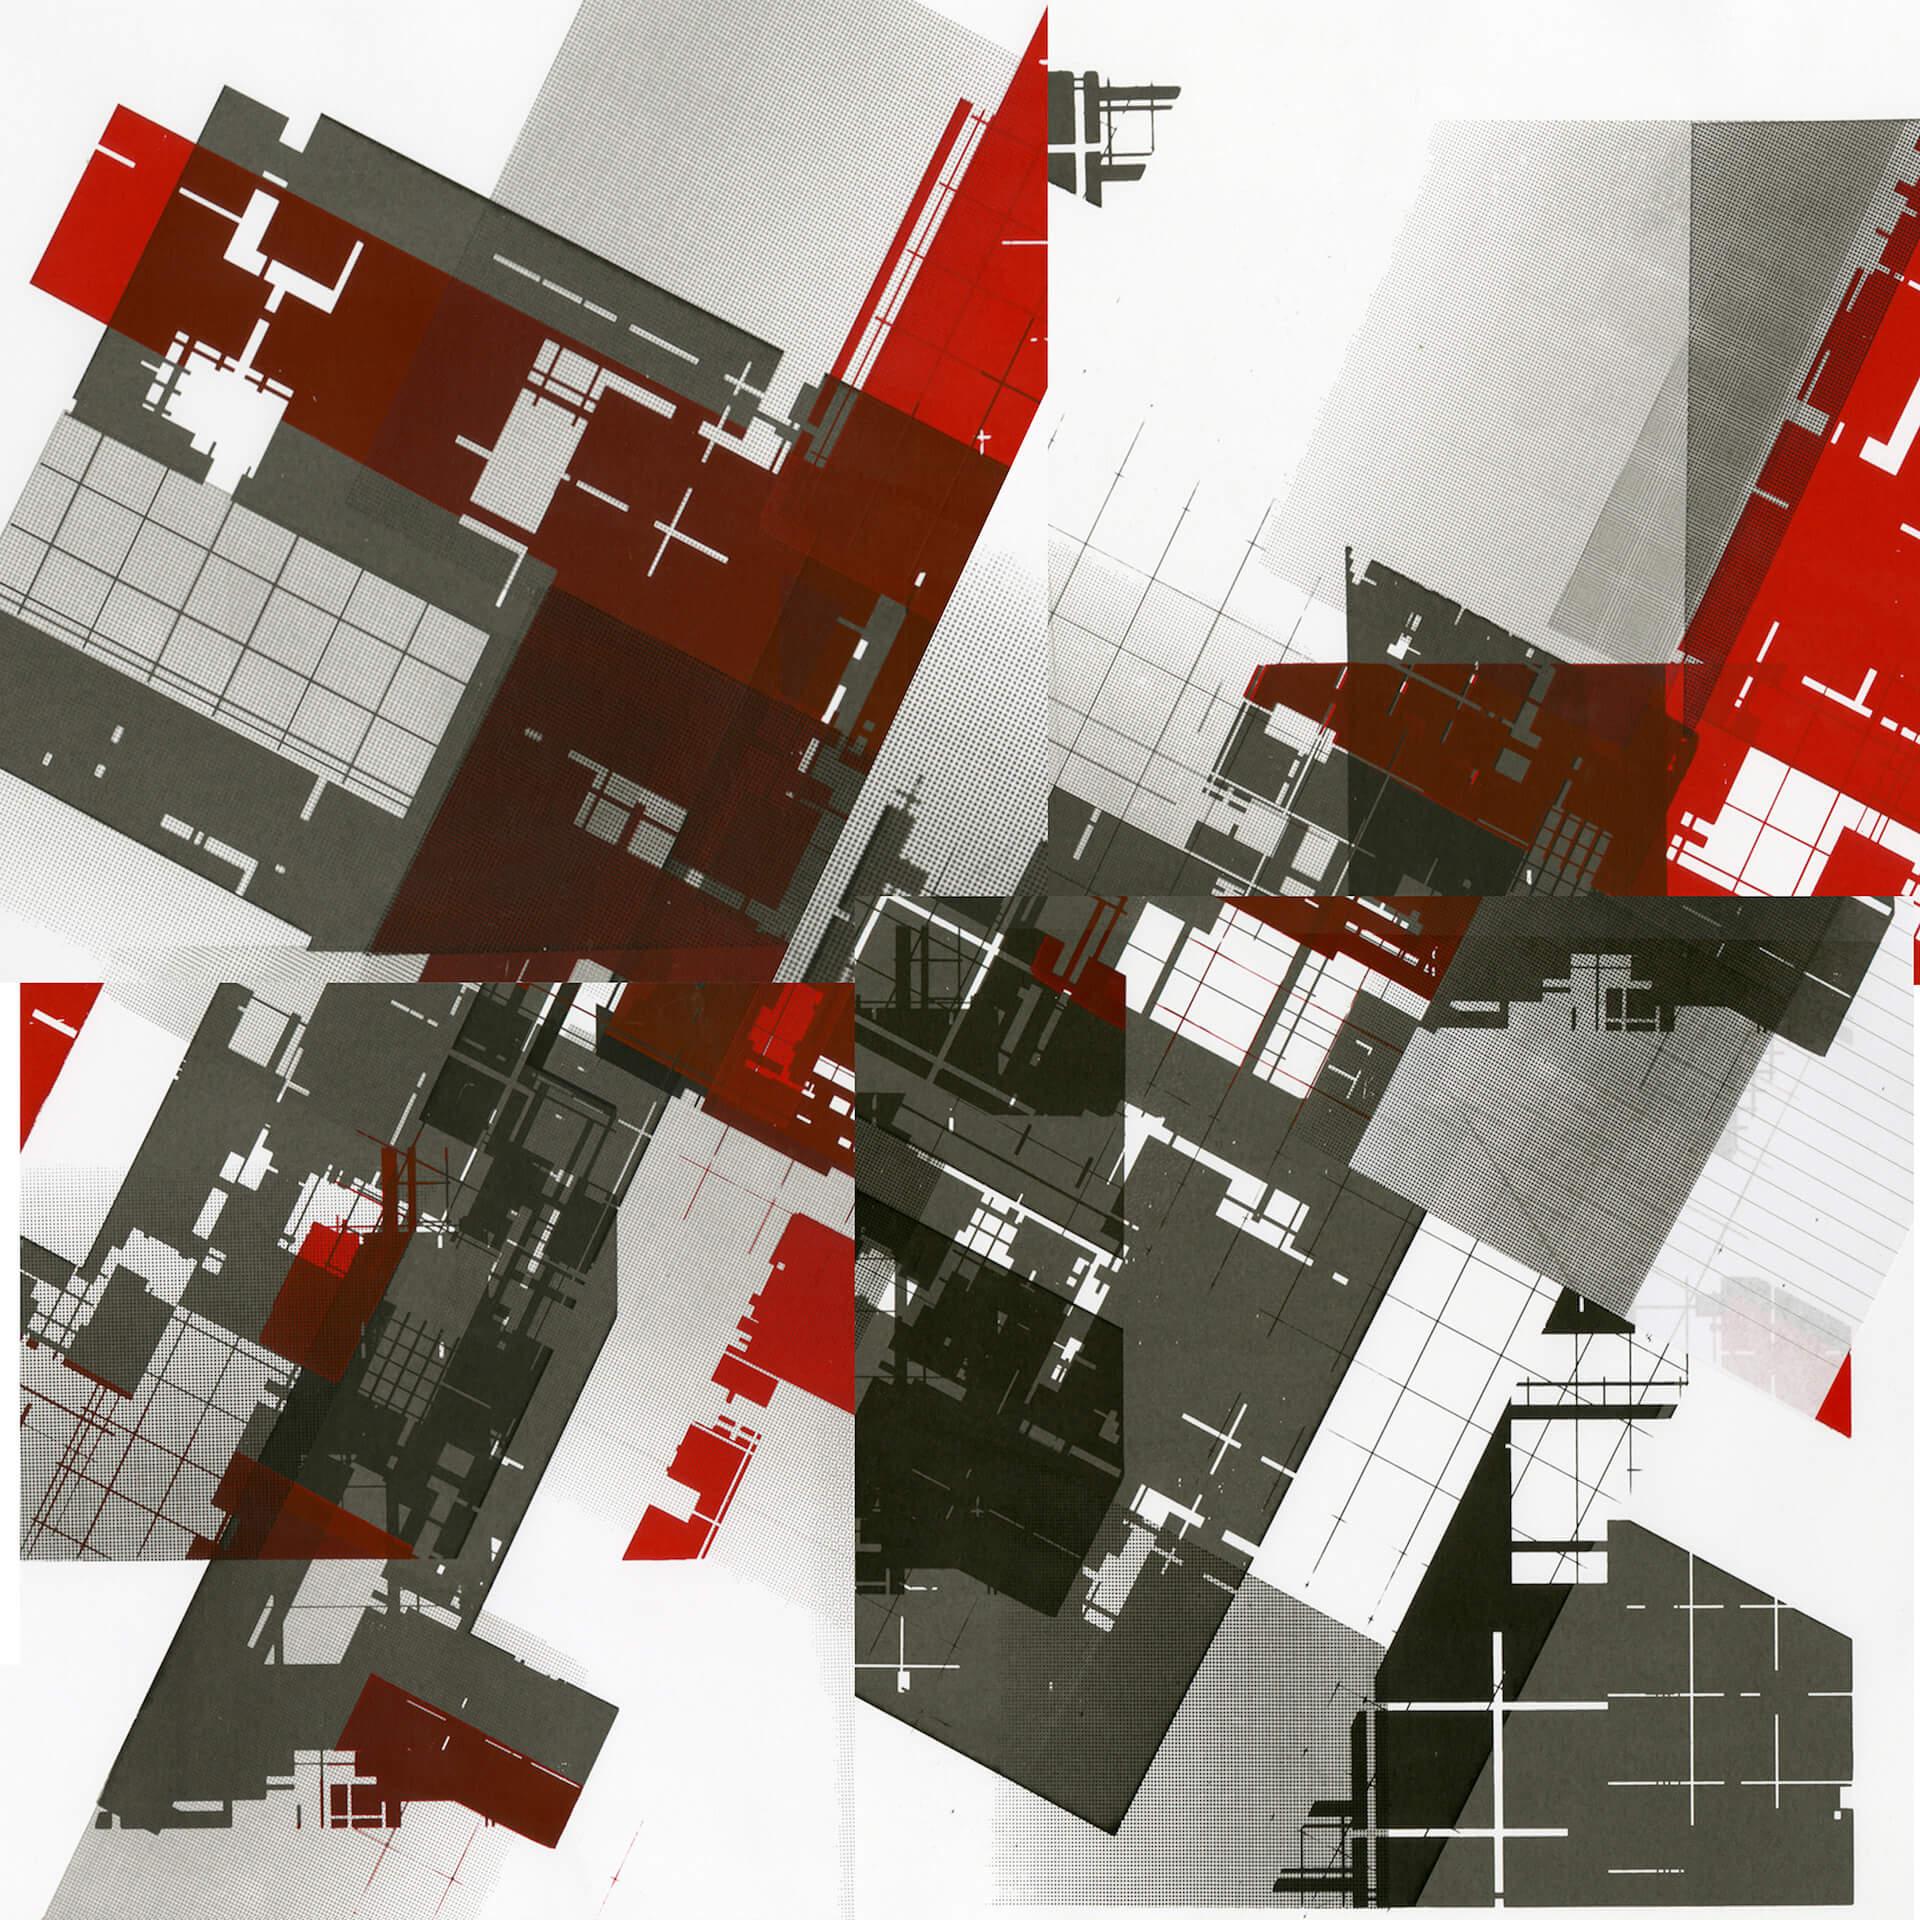 "KMによるニューアルバム『EVERYTHING INSIDE』がリリース決定!""Distortion(feat. 田我流)""が明日先行配信 music210525_km_2"